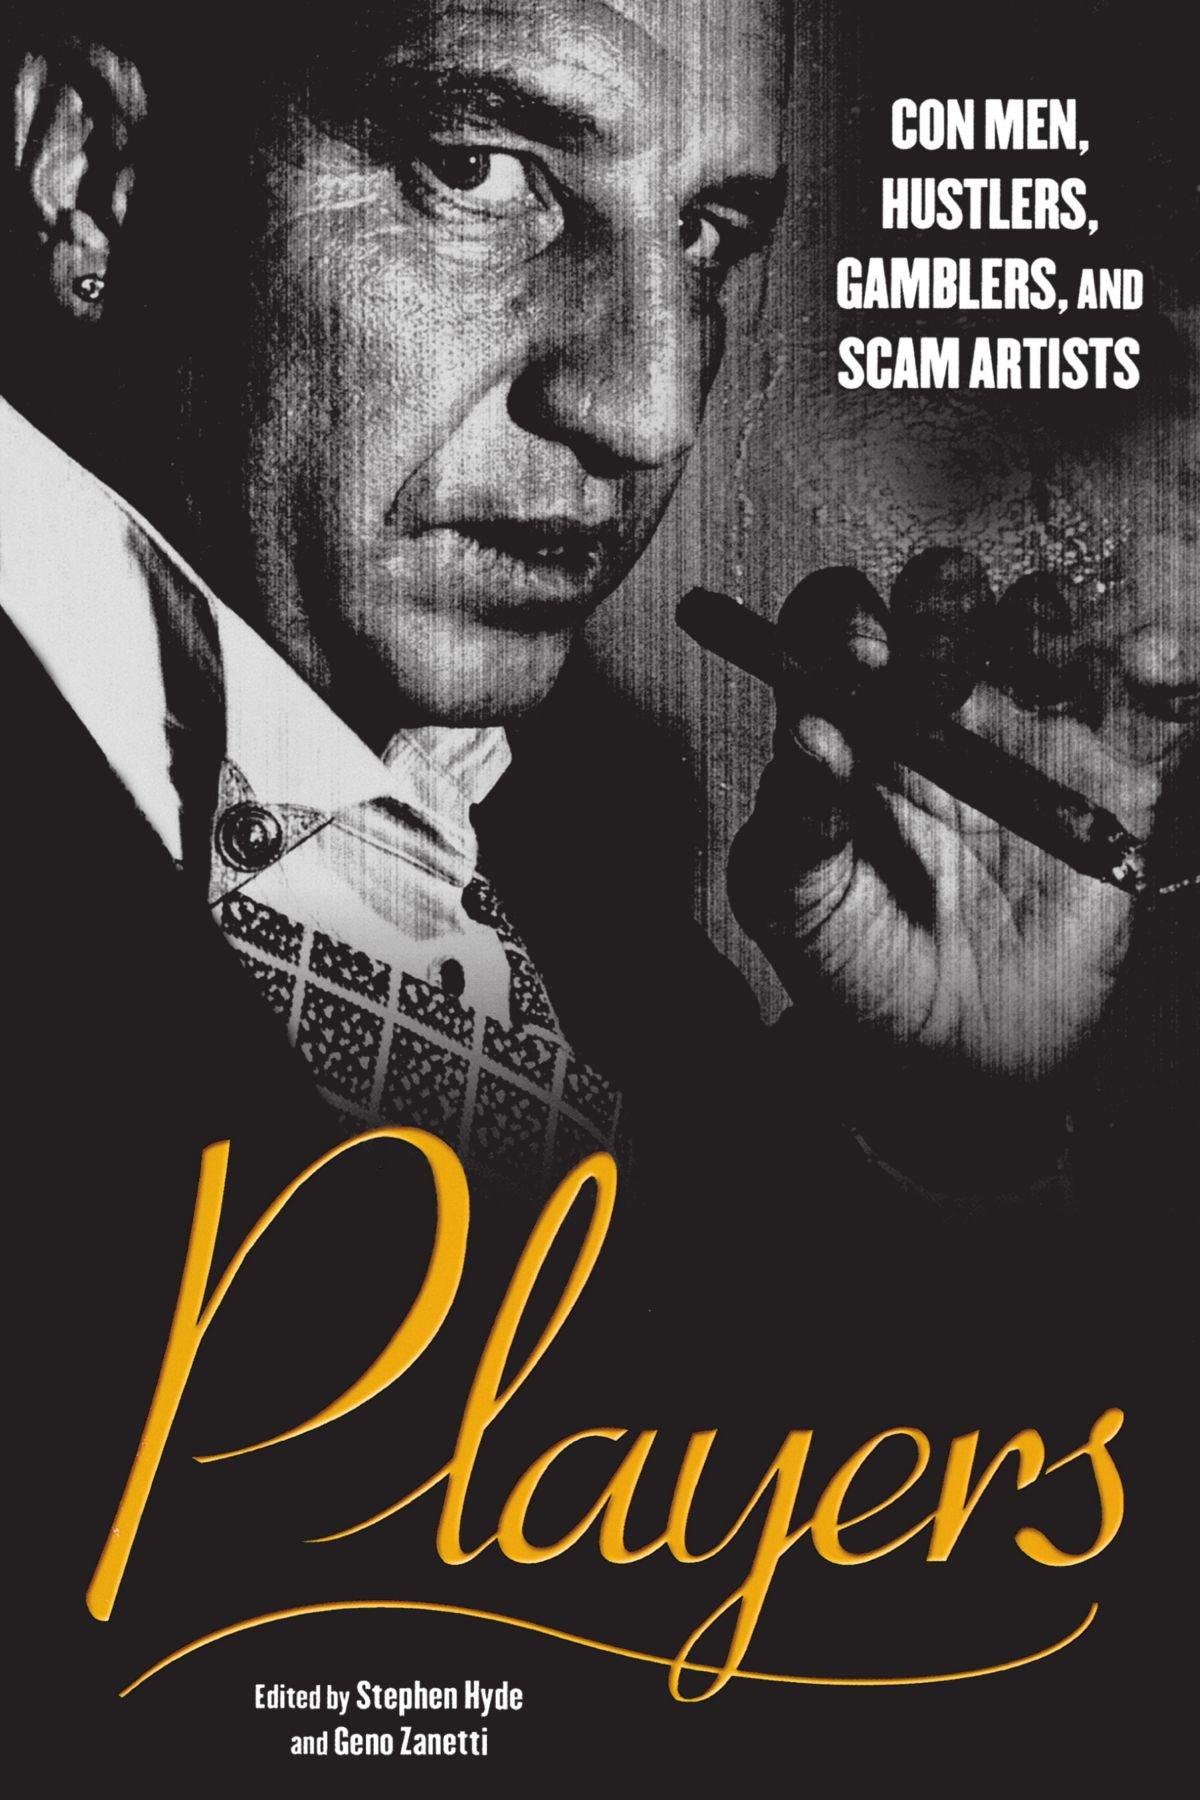 Players Con Men Hustlers Gamblers and Scam Artists Geno Zanetti